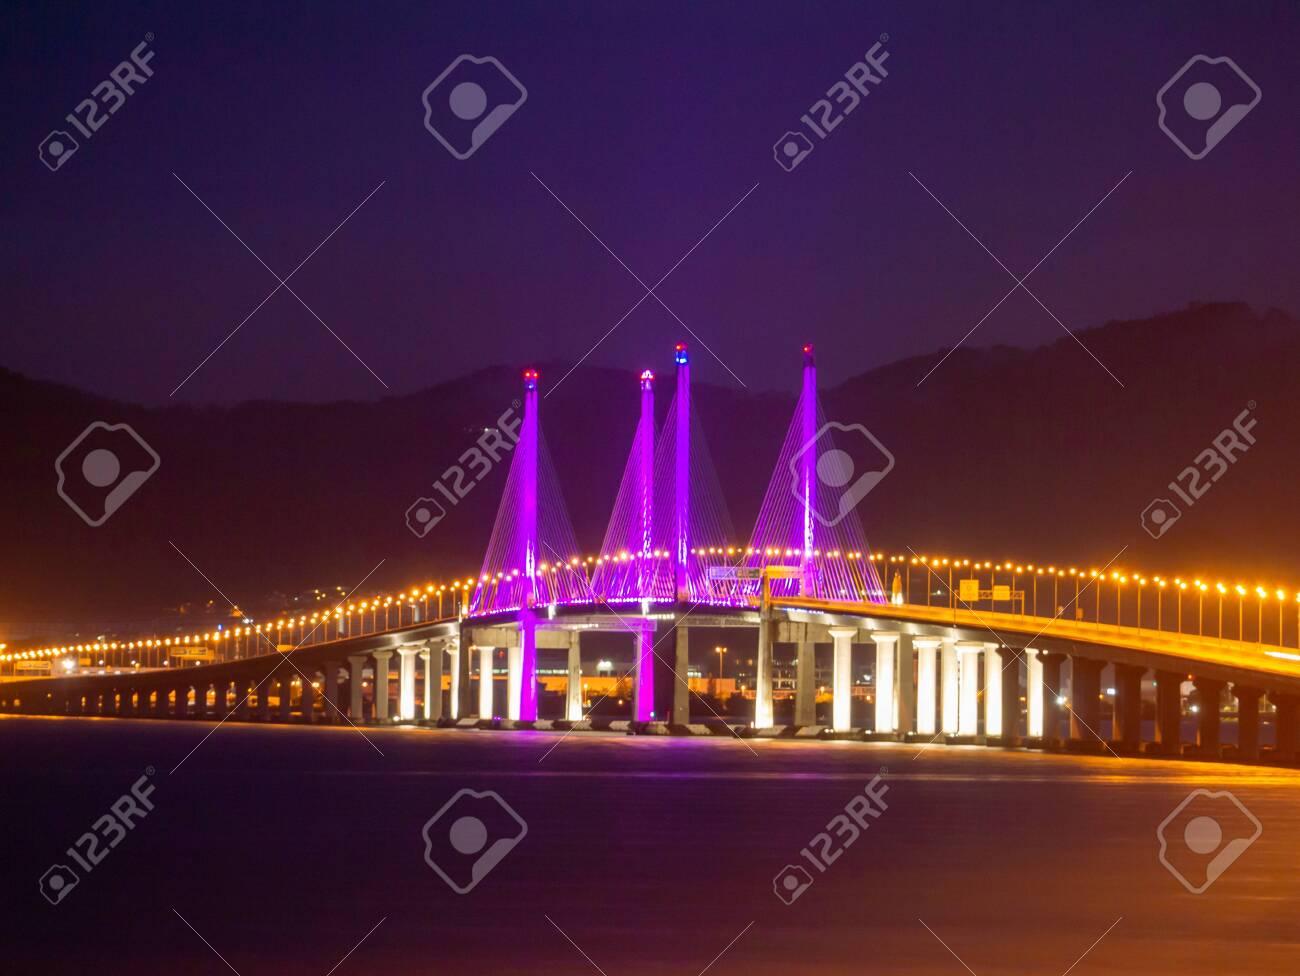 Penang Second Bridge with purple lighting in dawn hour. - 143081531